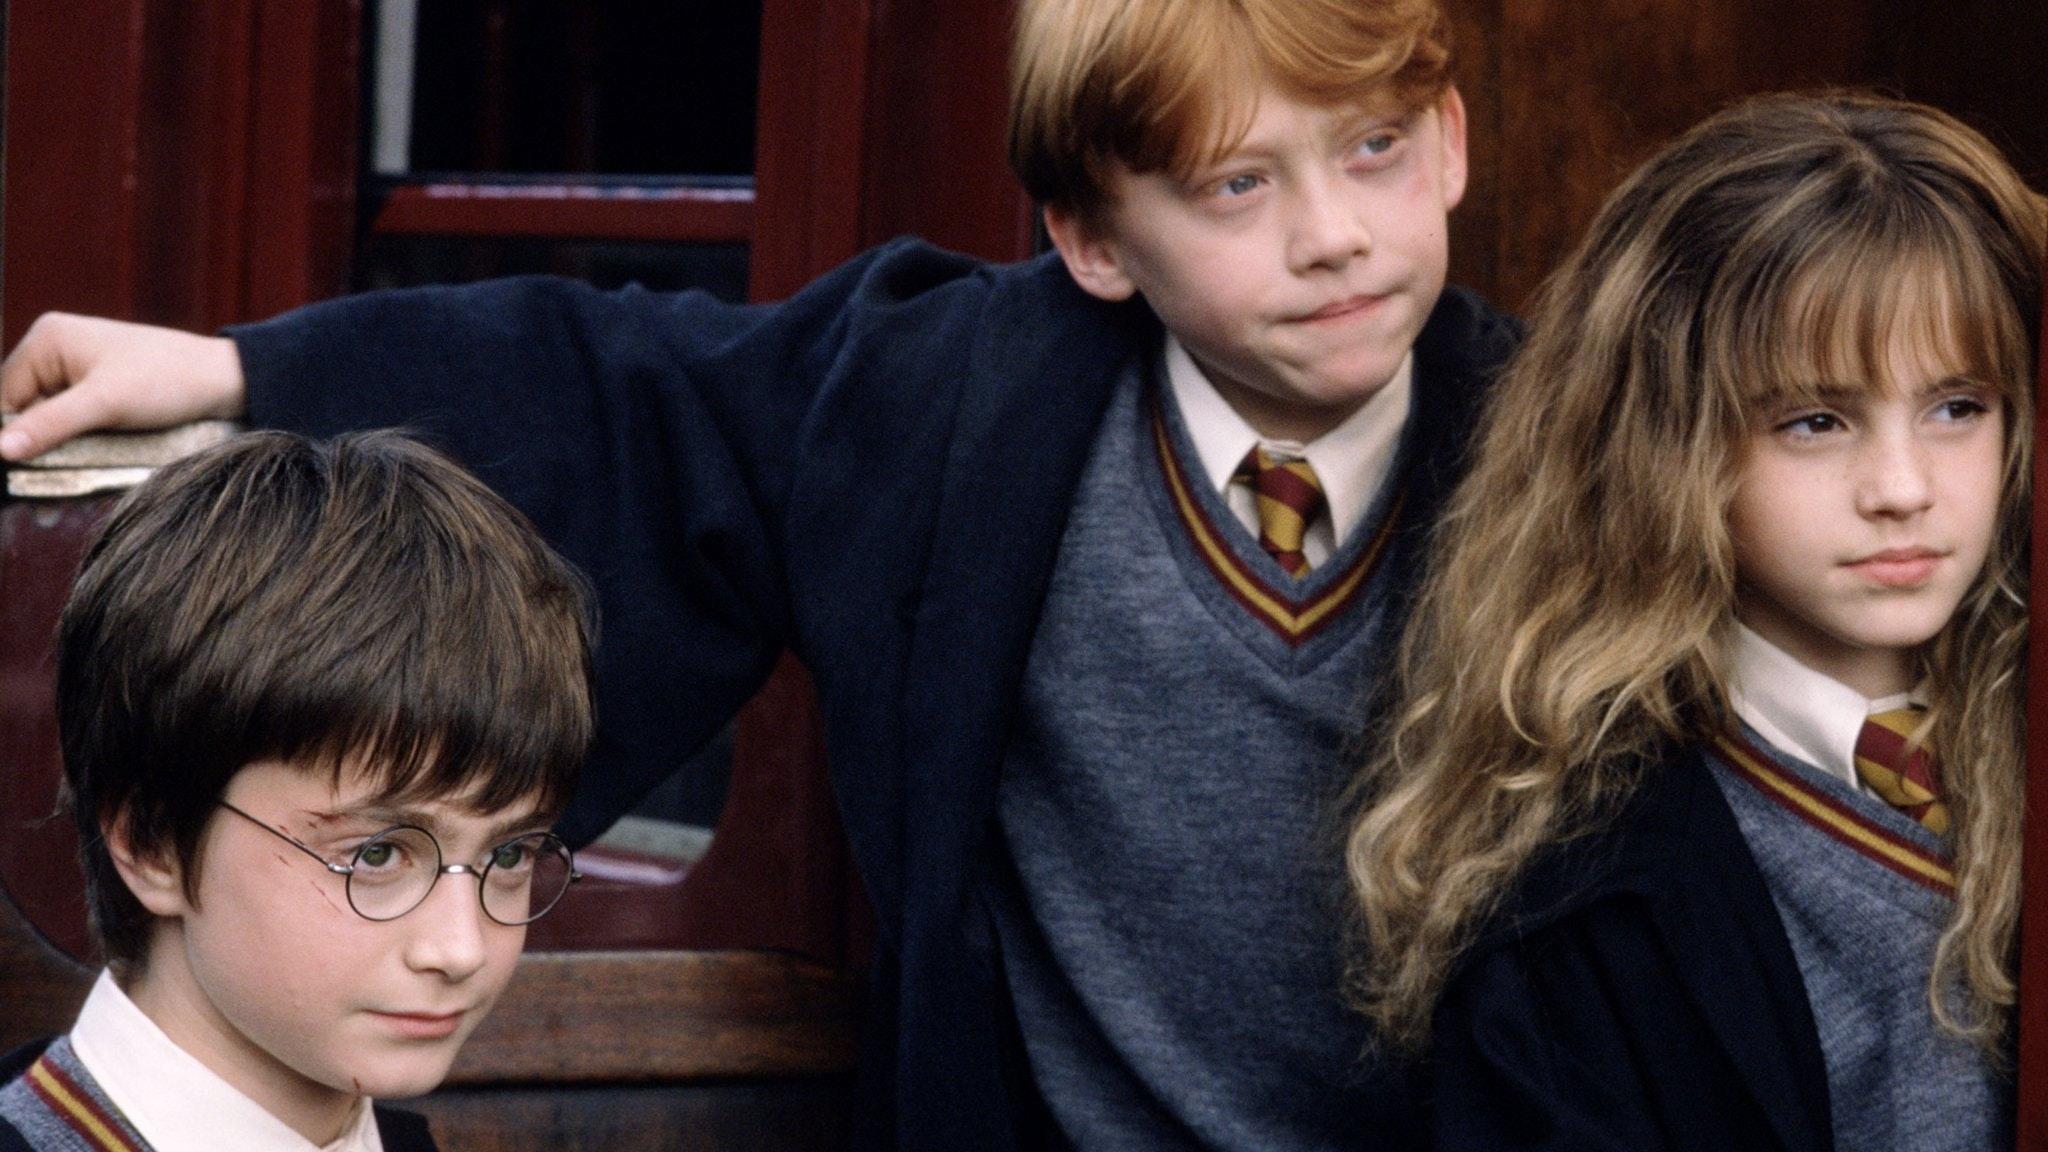 Image - Harry Potter